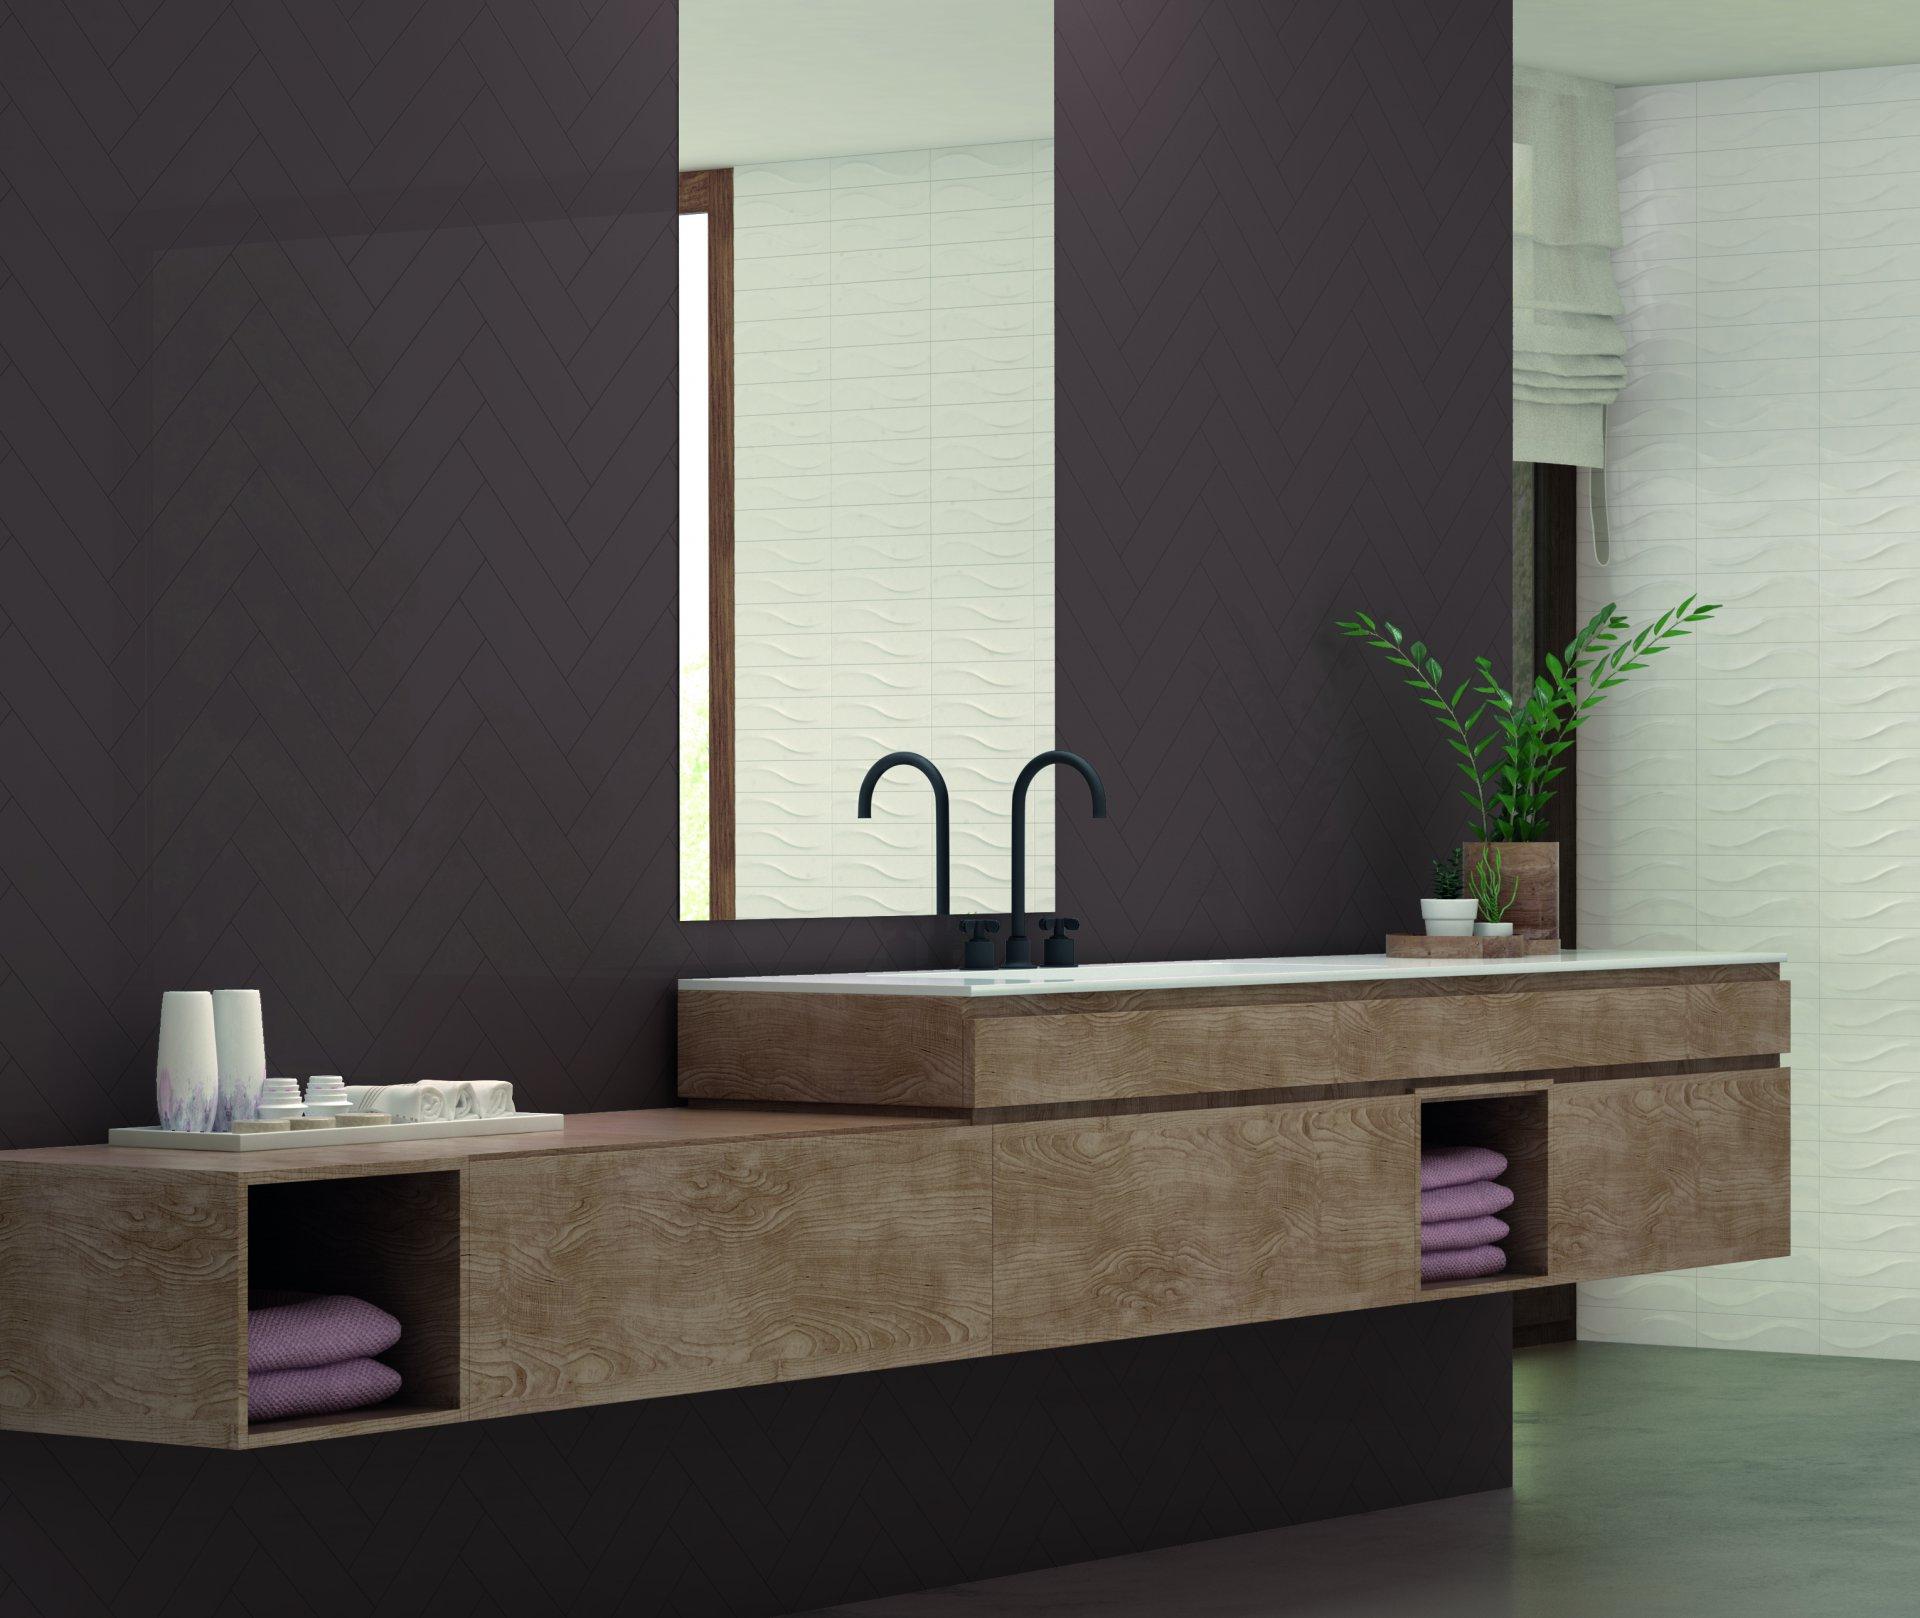 3x12 Bellini Metro Marron Ceramic Glossy Wall Tile